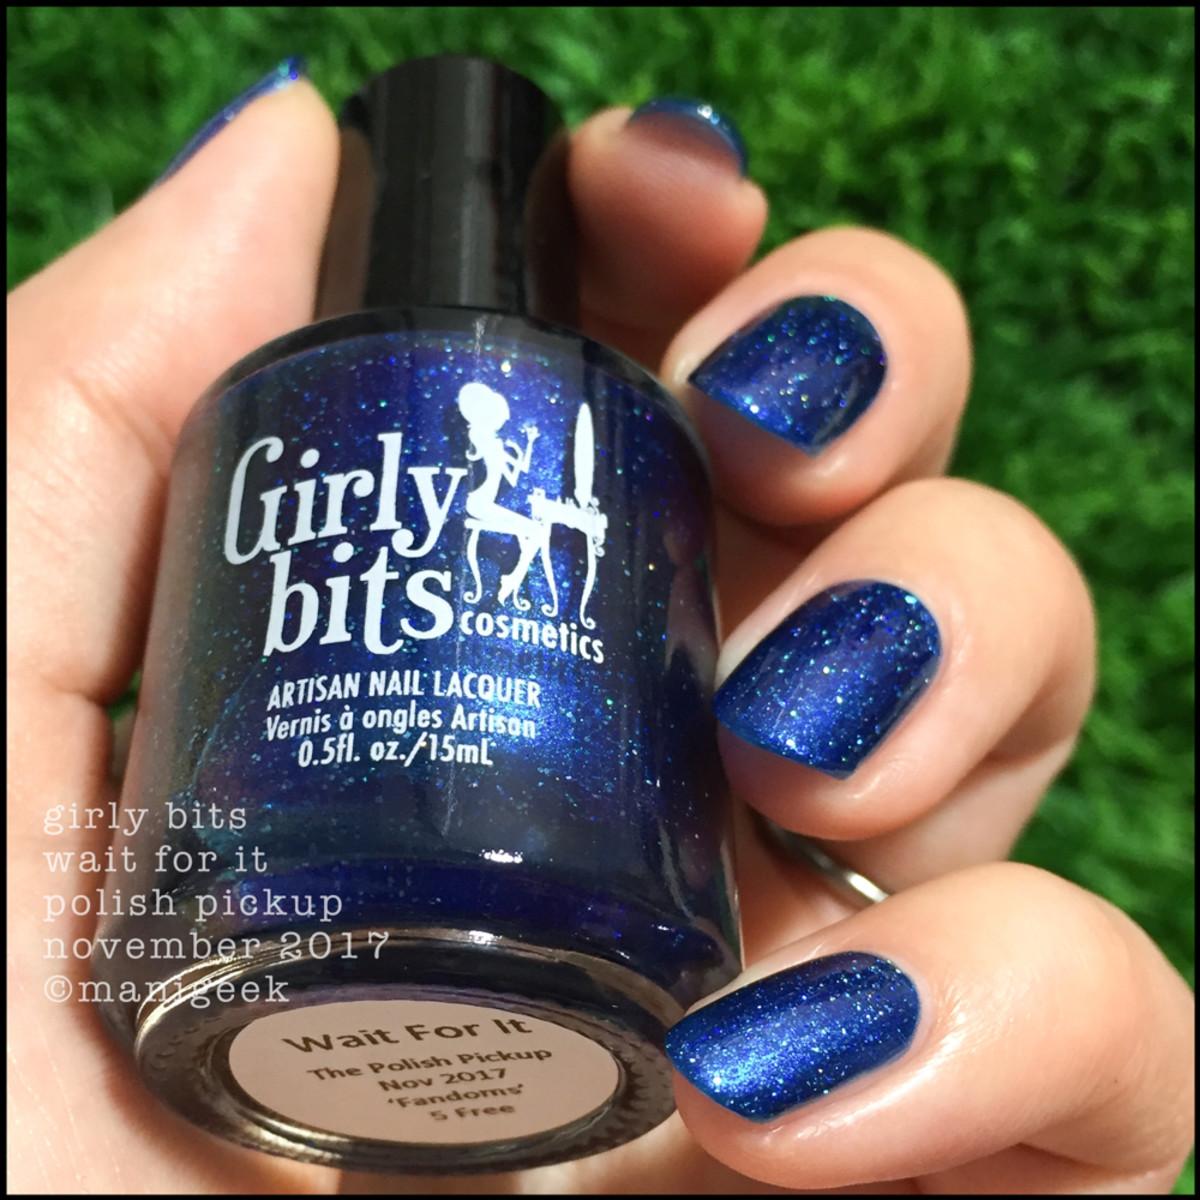 Girly Bits Wait For It 3 _ Girly Bits Polish Pickup November 2017